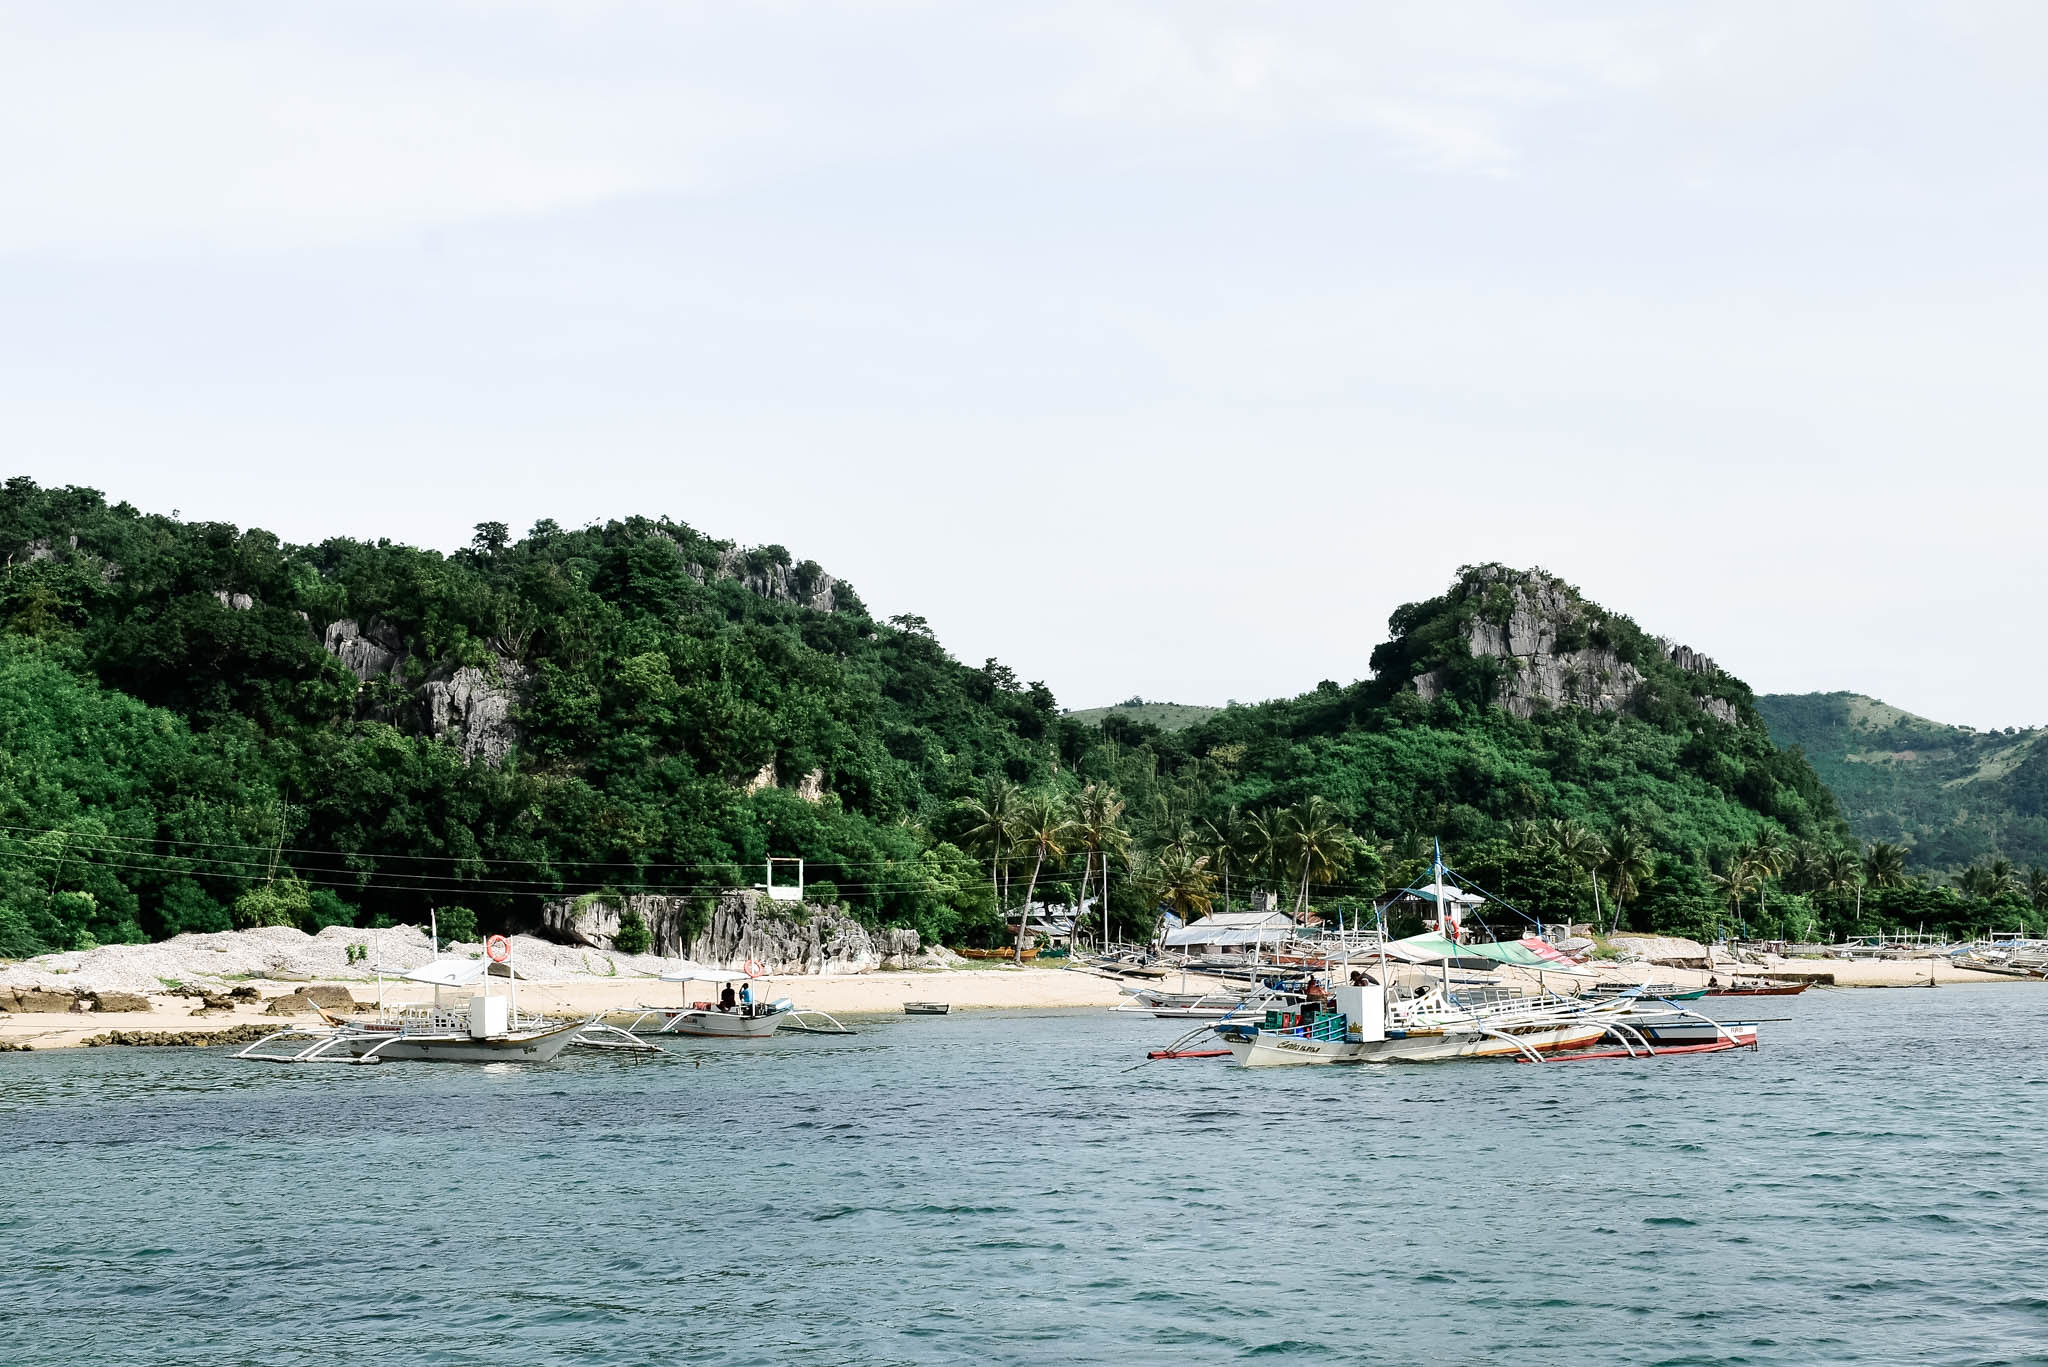 gigantes norte island (1 of 1)